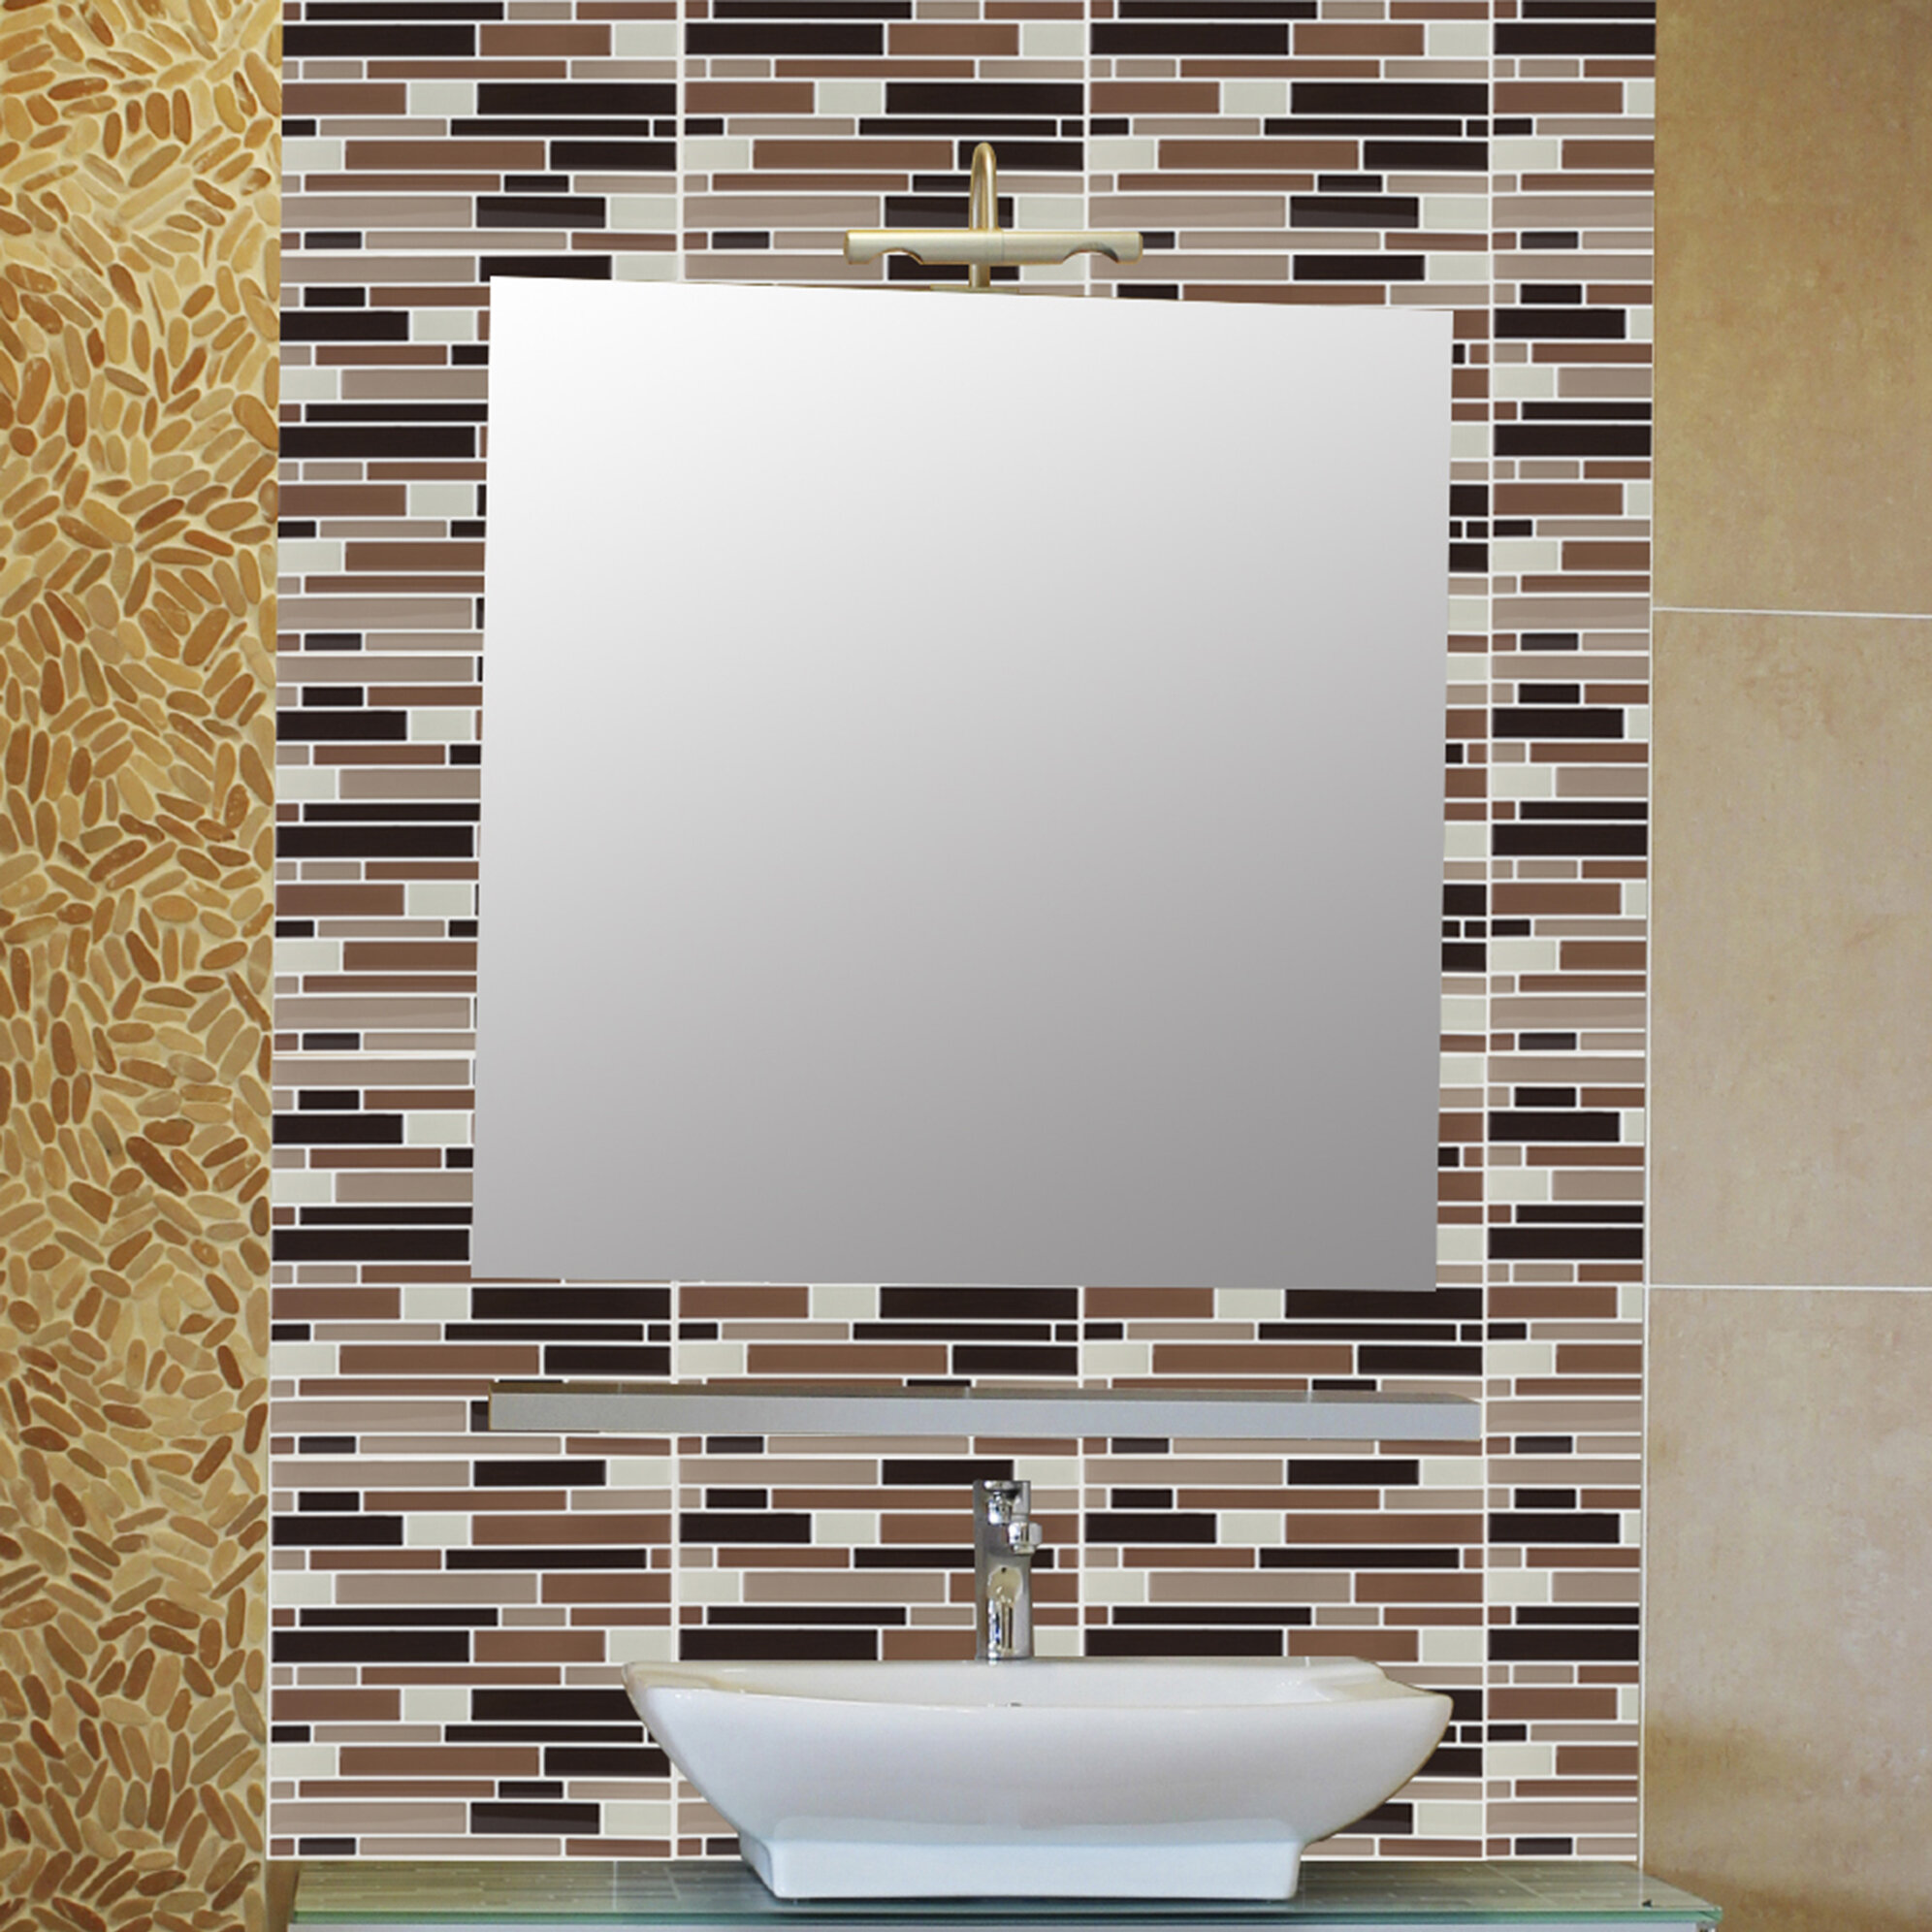 Peel Stick Mosaic Tiles Tile Design Ideas